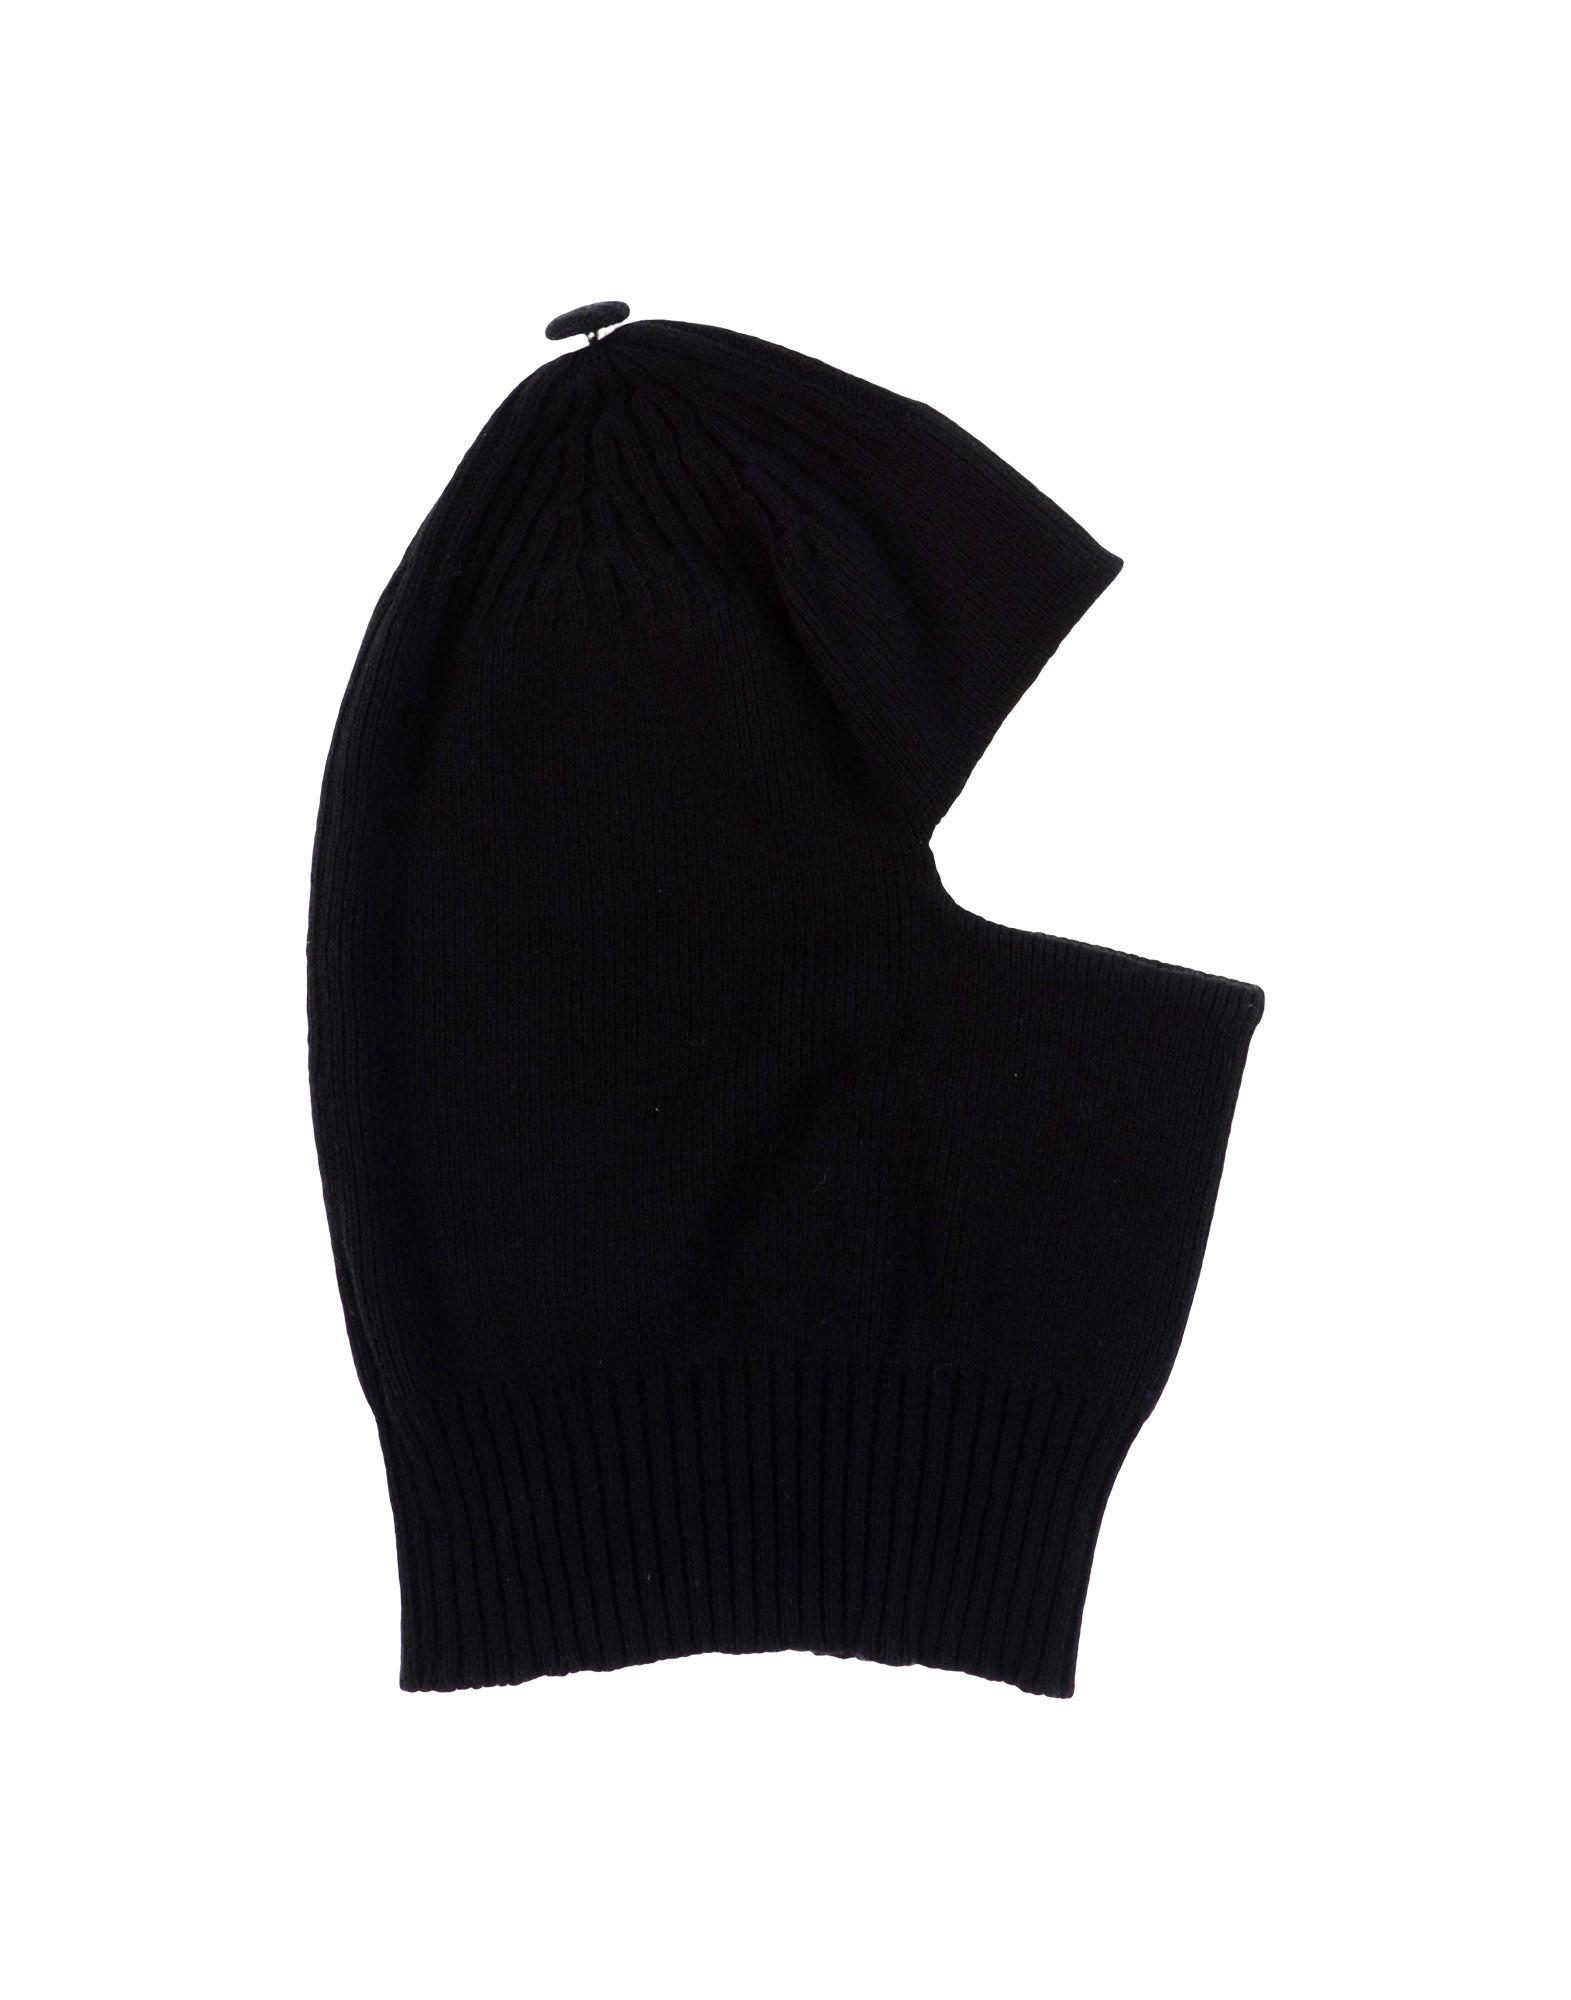 Lyst - Patrizia Pepe Hat in Black c1312f21eb3d